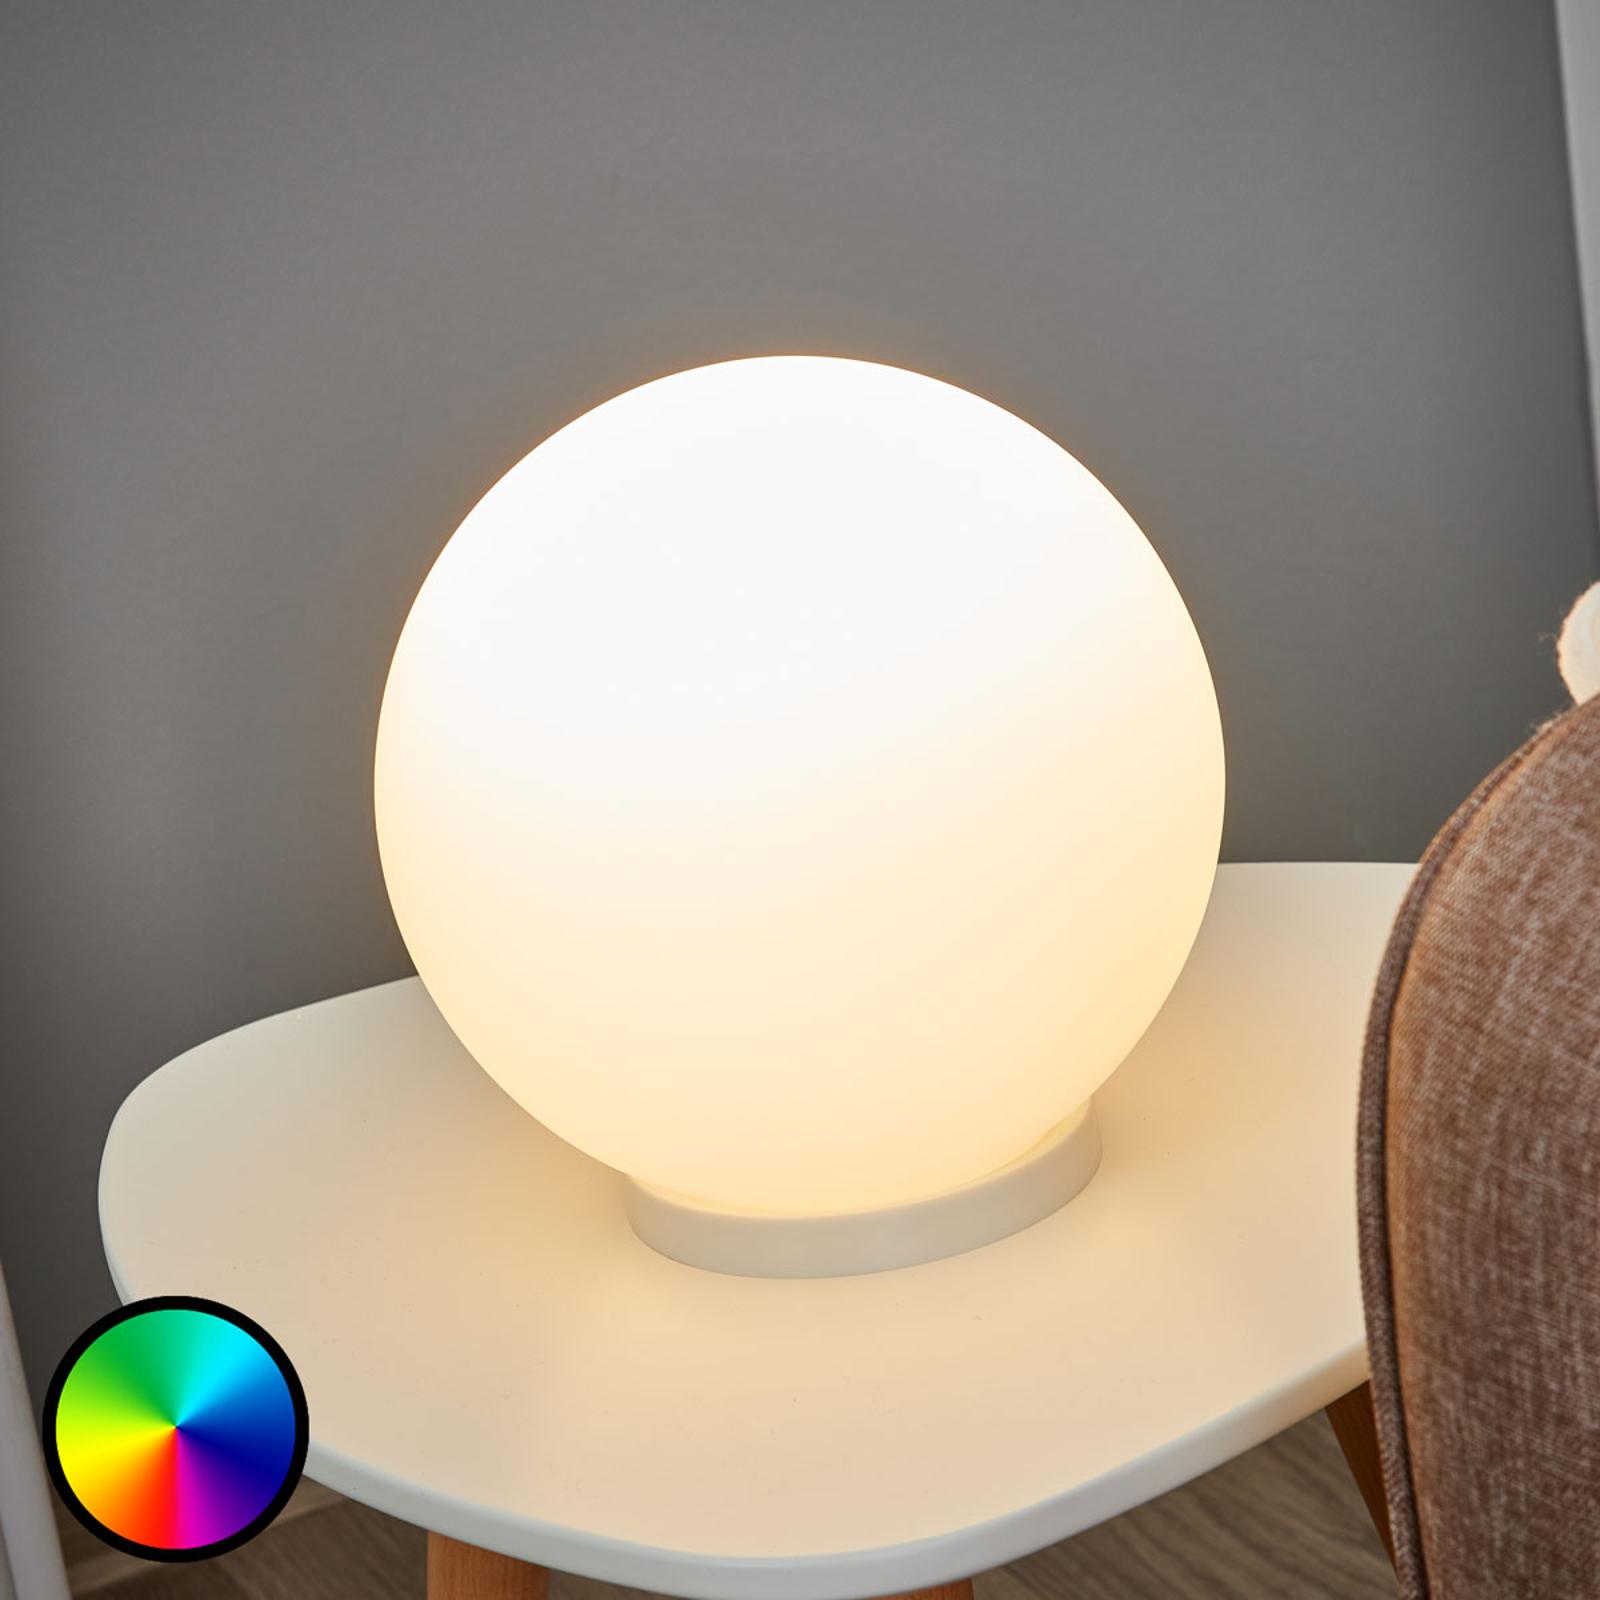 Klotformad bordslampa Rondo-C LED RGBW